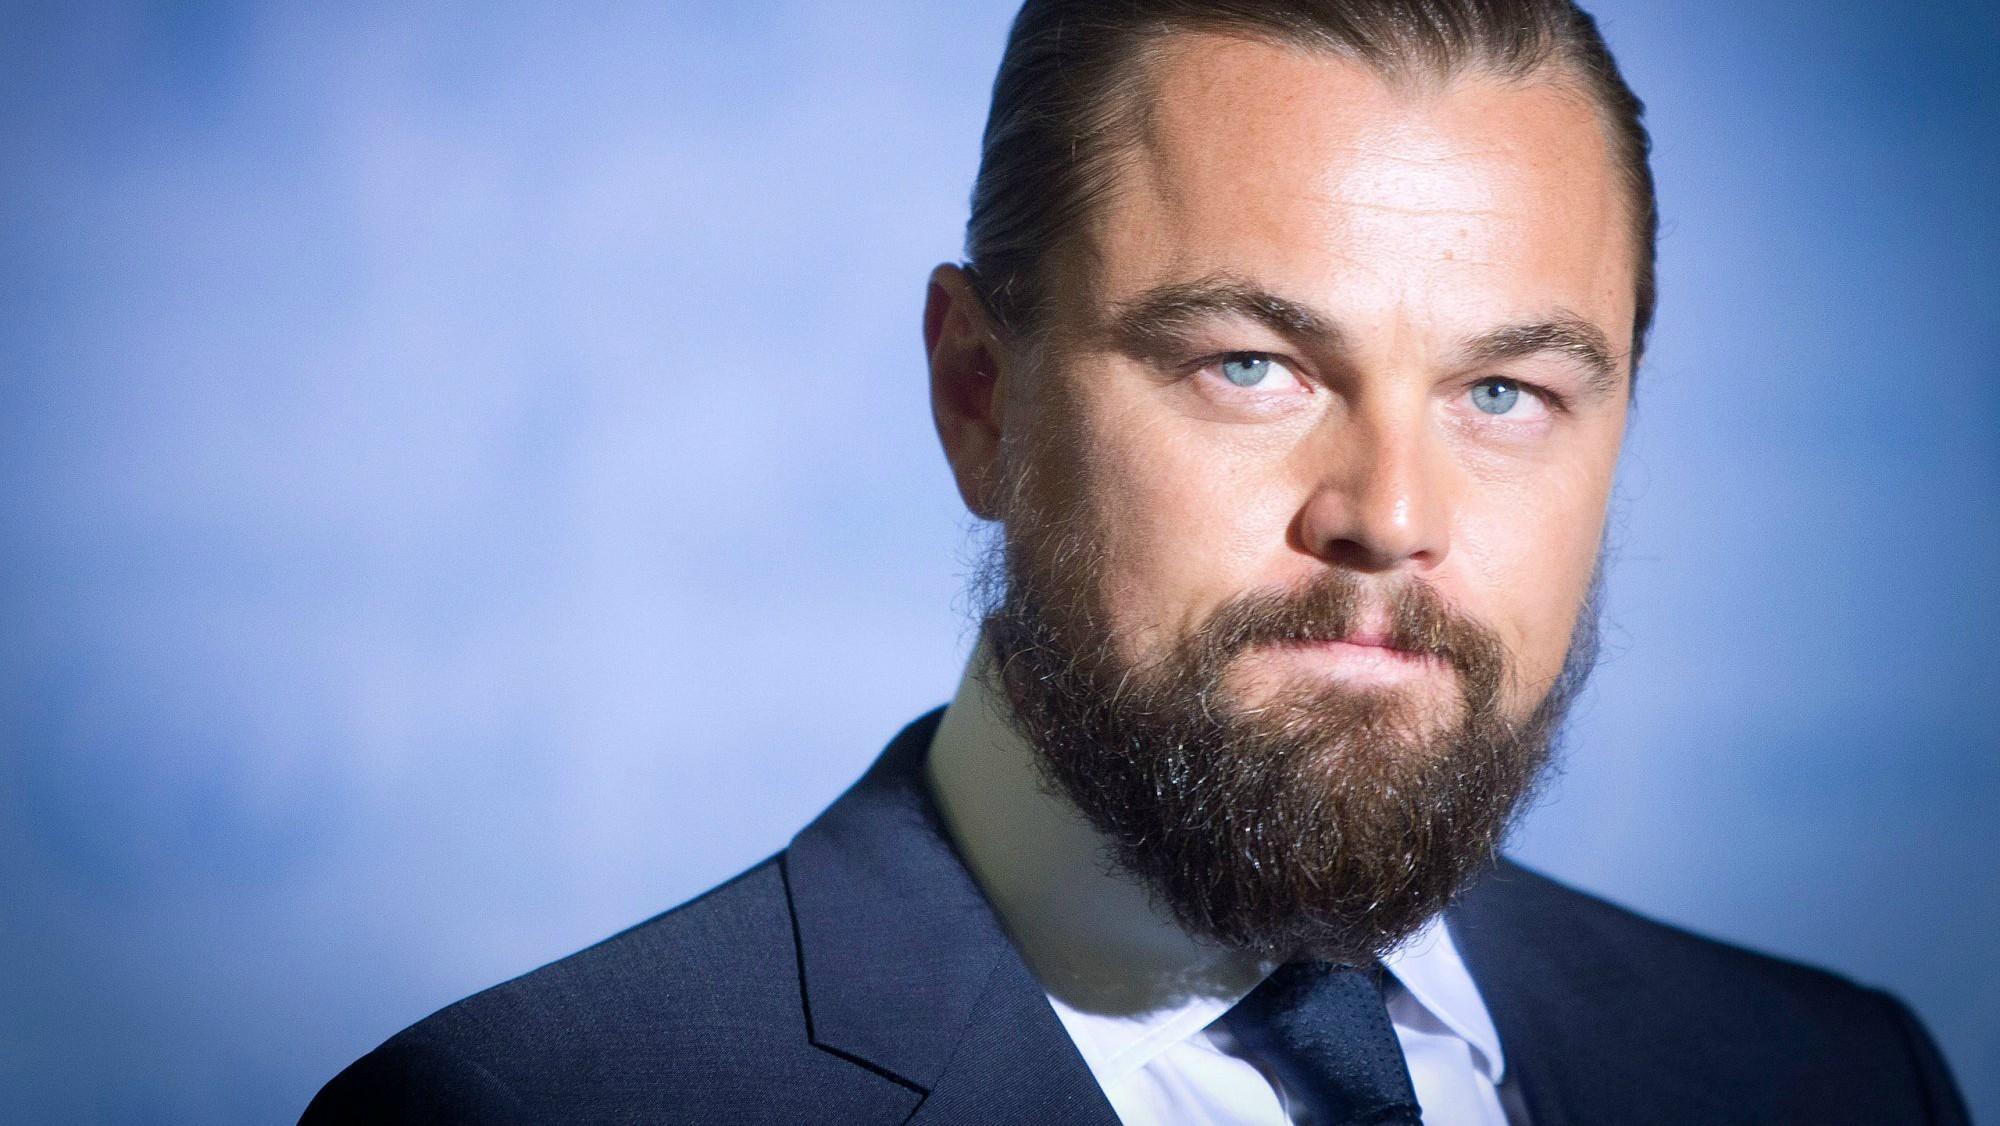 Leonardo DiCaprio as a white Rumi? Twitter isn't having it